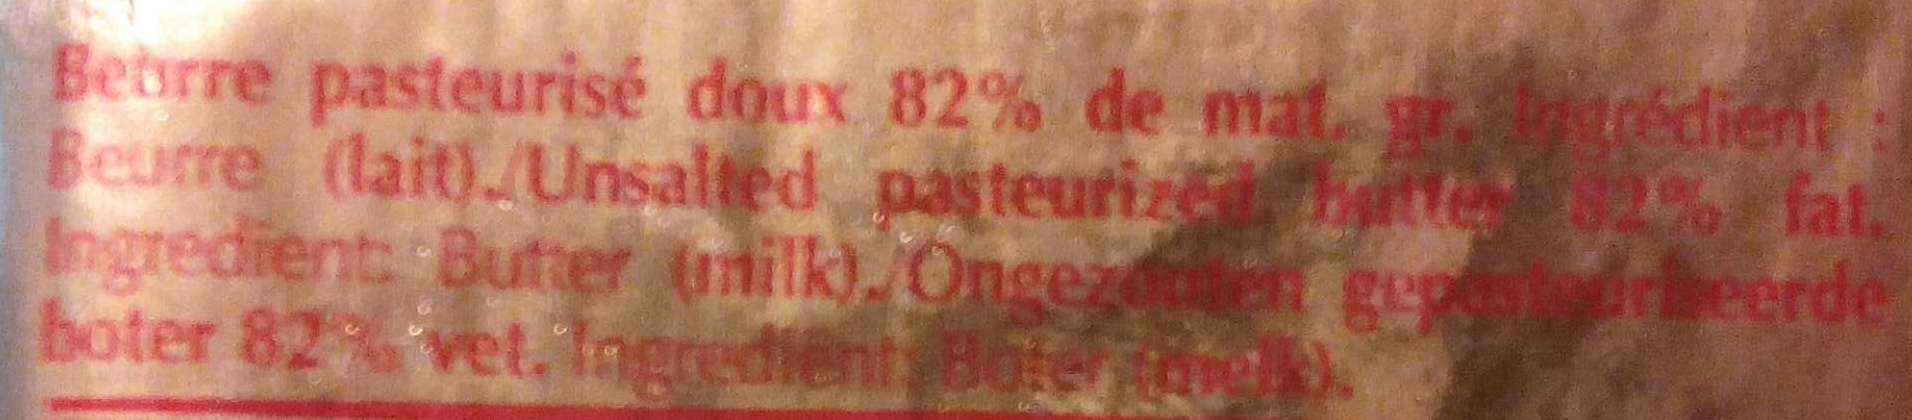 Beurre pasteurisé Doux - Ingrediënten